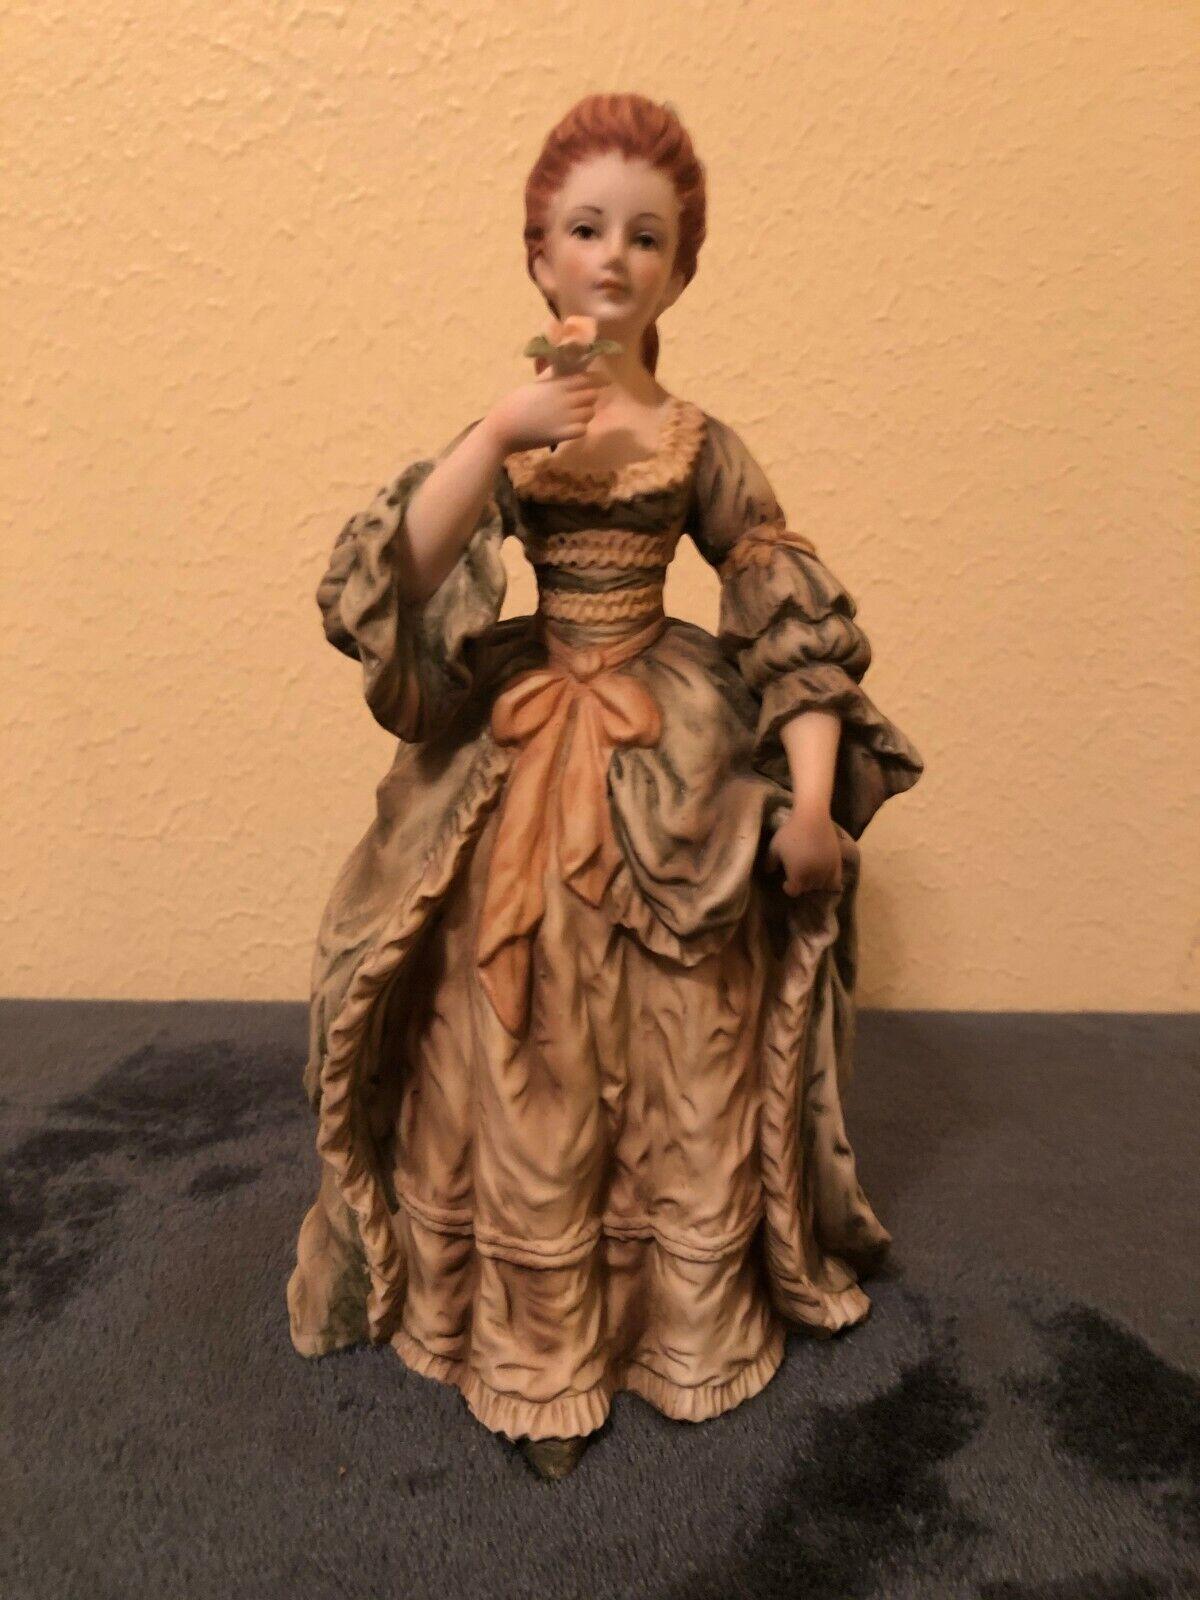 Vintage Candrea Ceremaics Women 9 Inches - $13.00